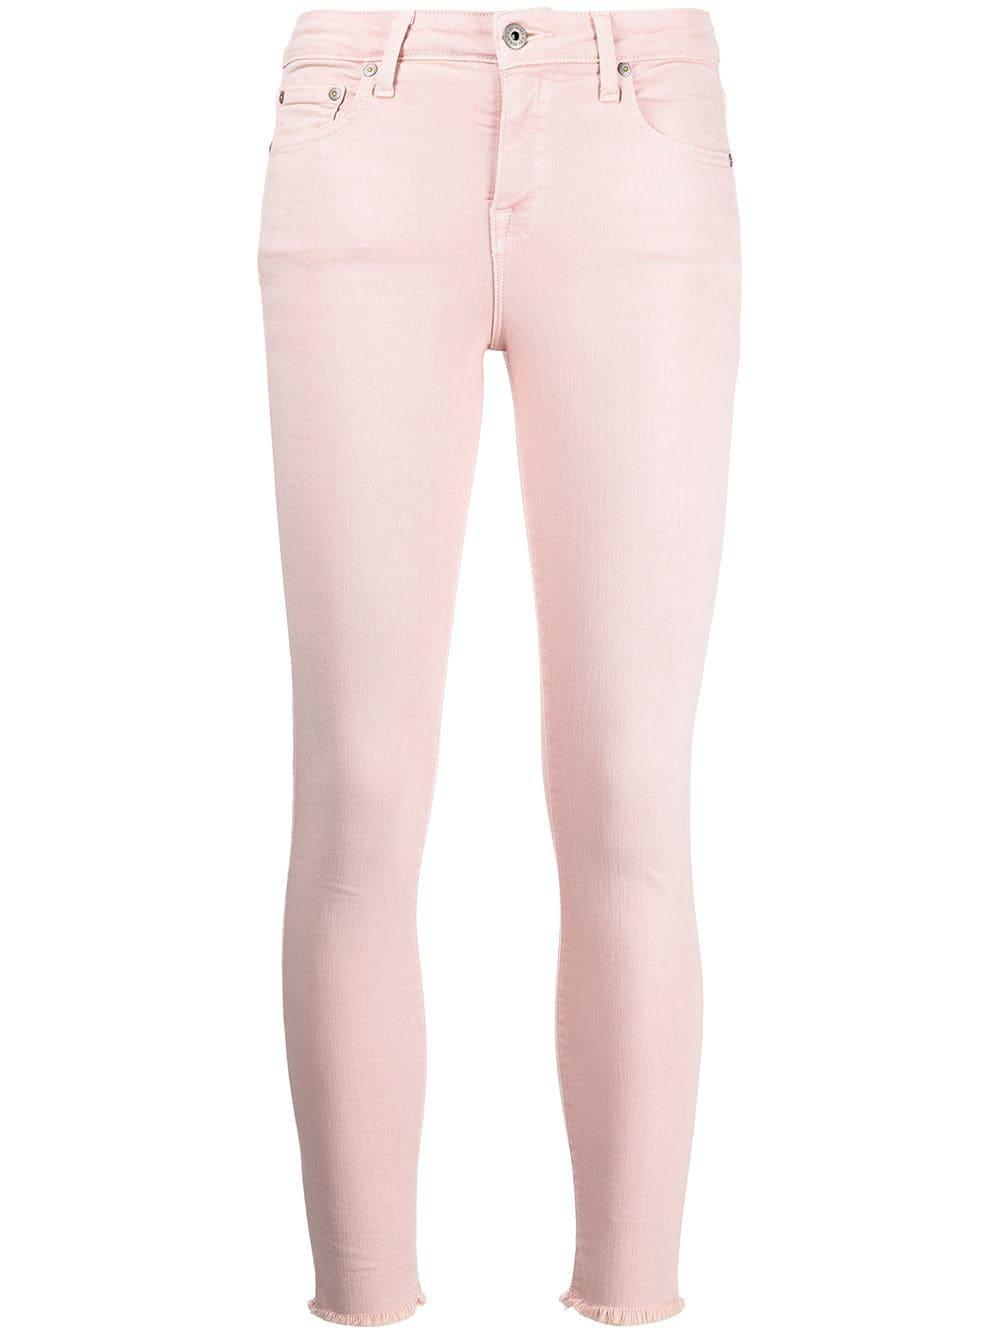 Costa Mid- Rise Skinny Jean Item # 521-4099-ST-DR